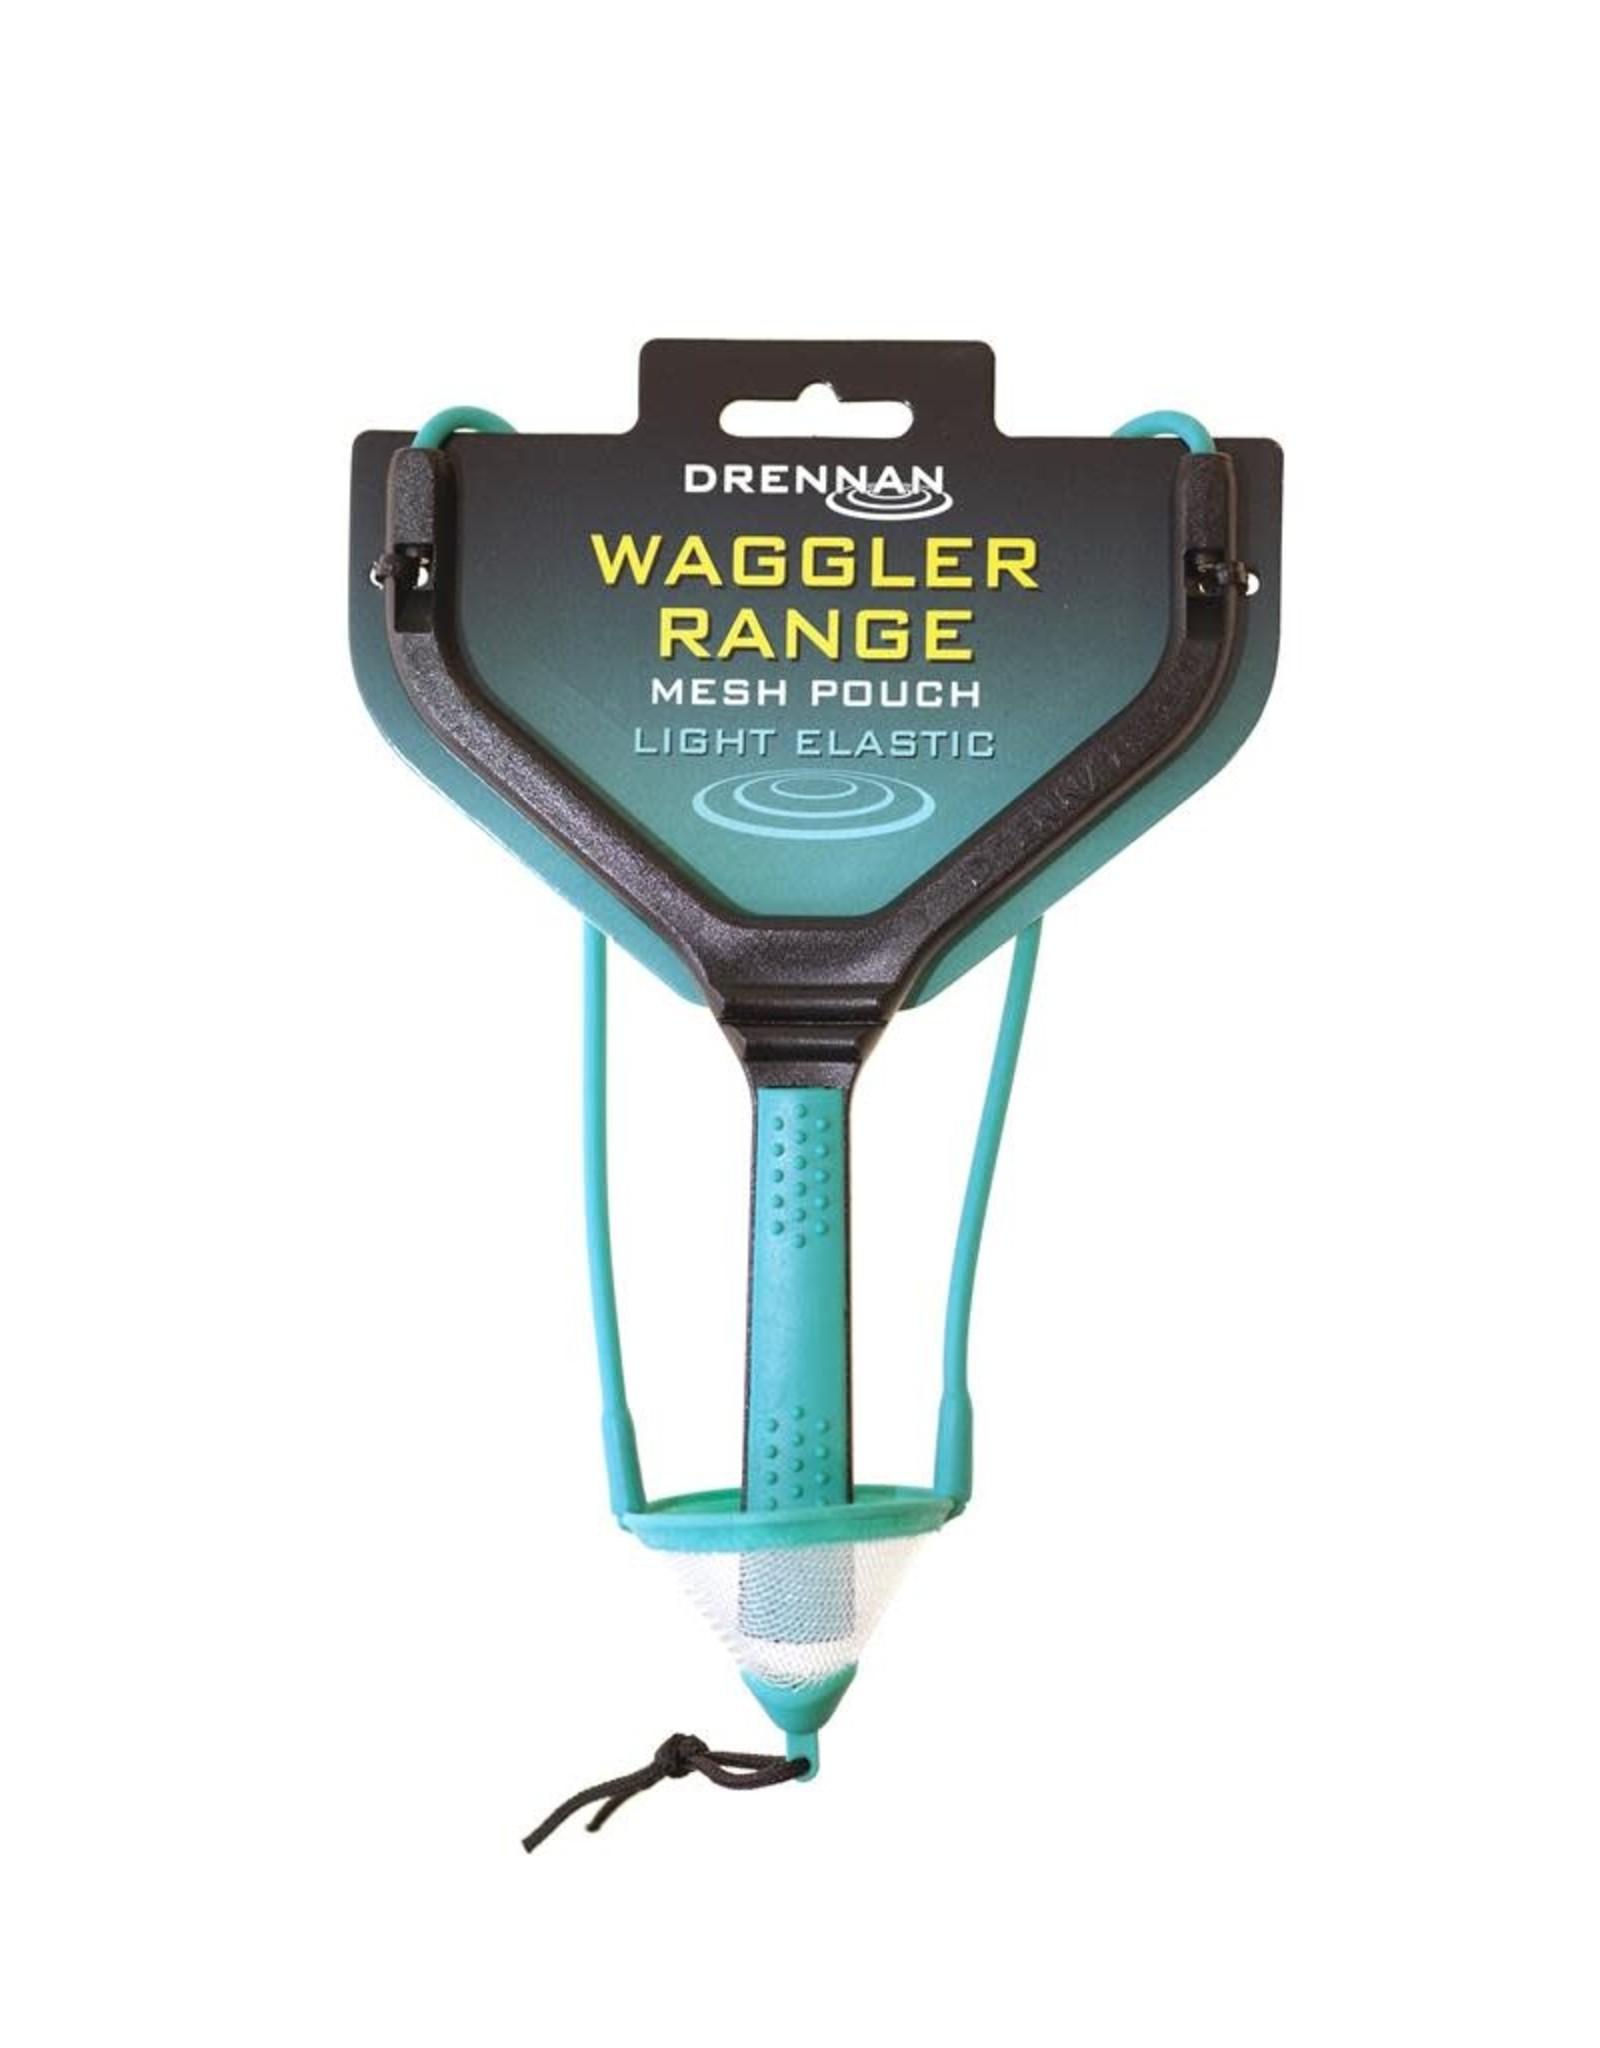 DRENNAN Waggler Range Light